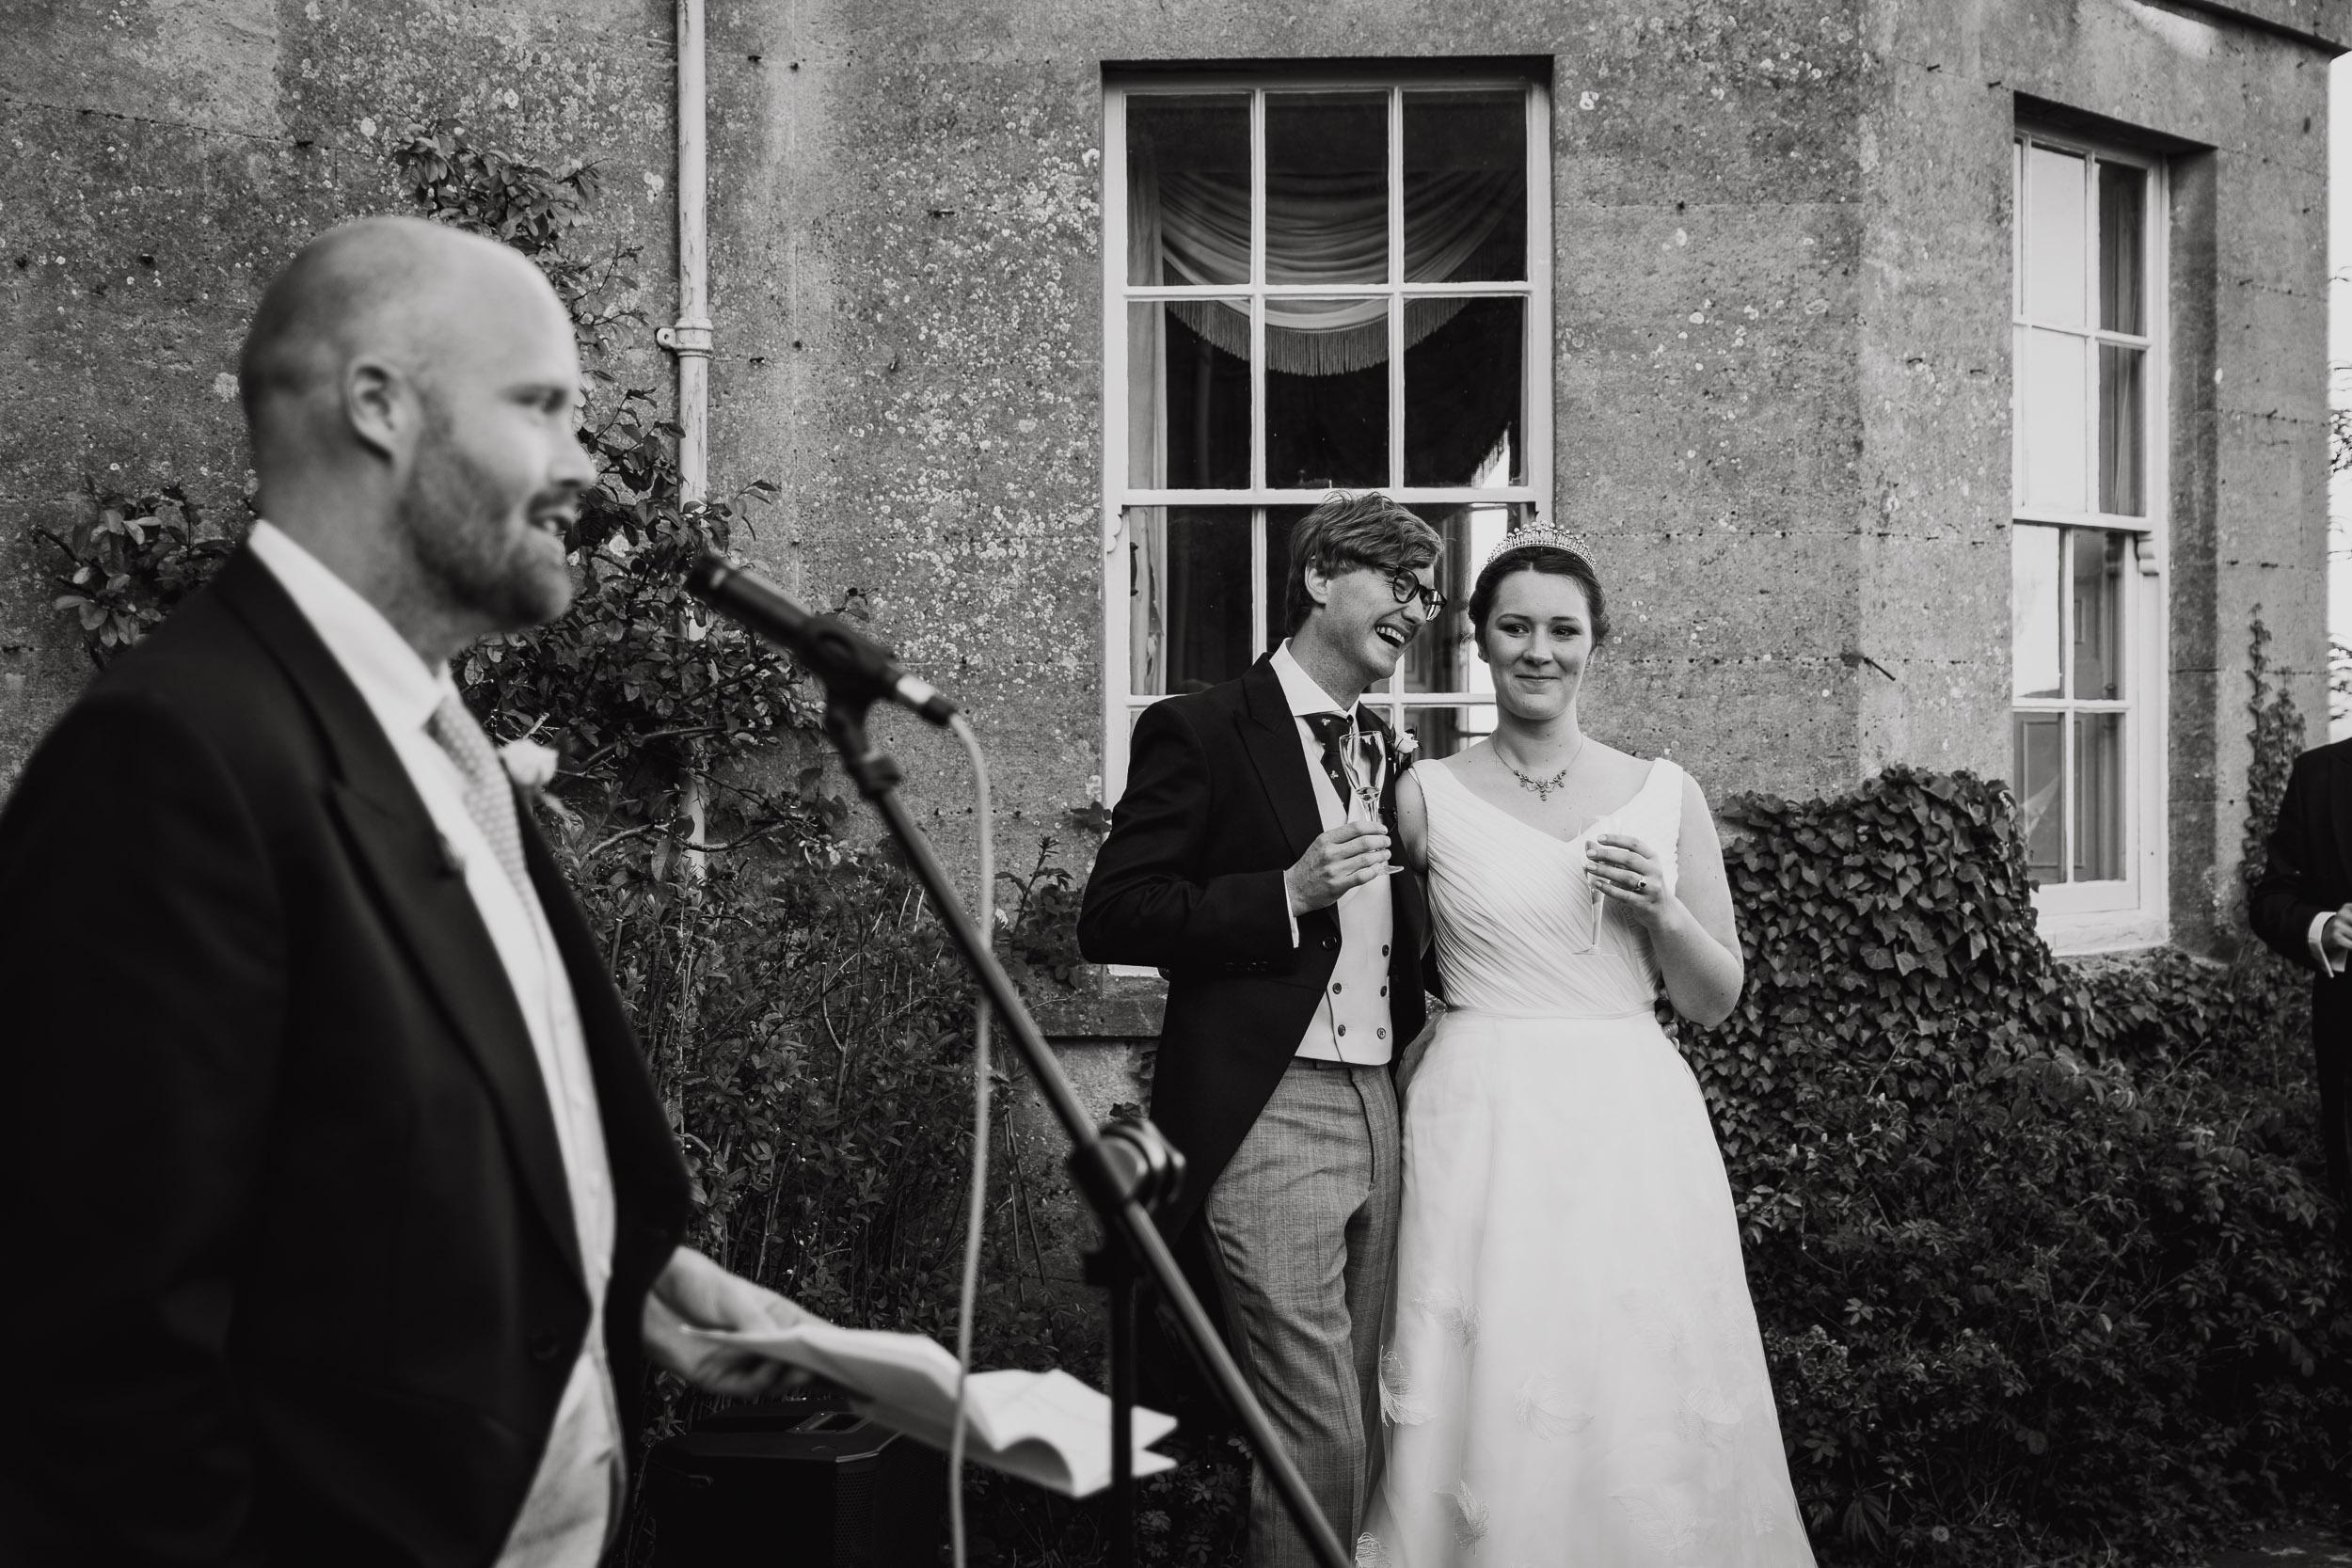 hamswell-house-wedding-photographer-w99.jpg